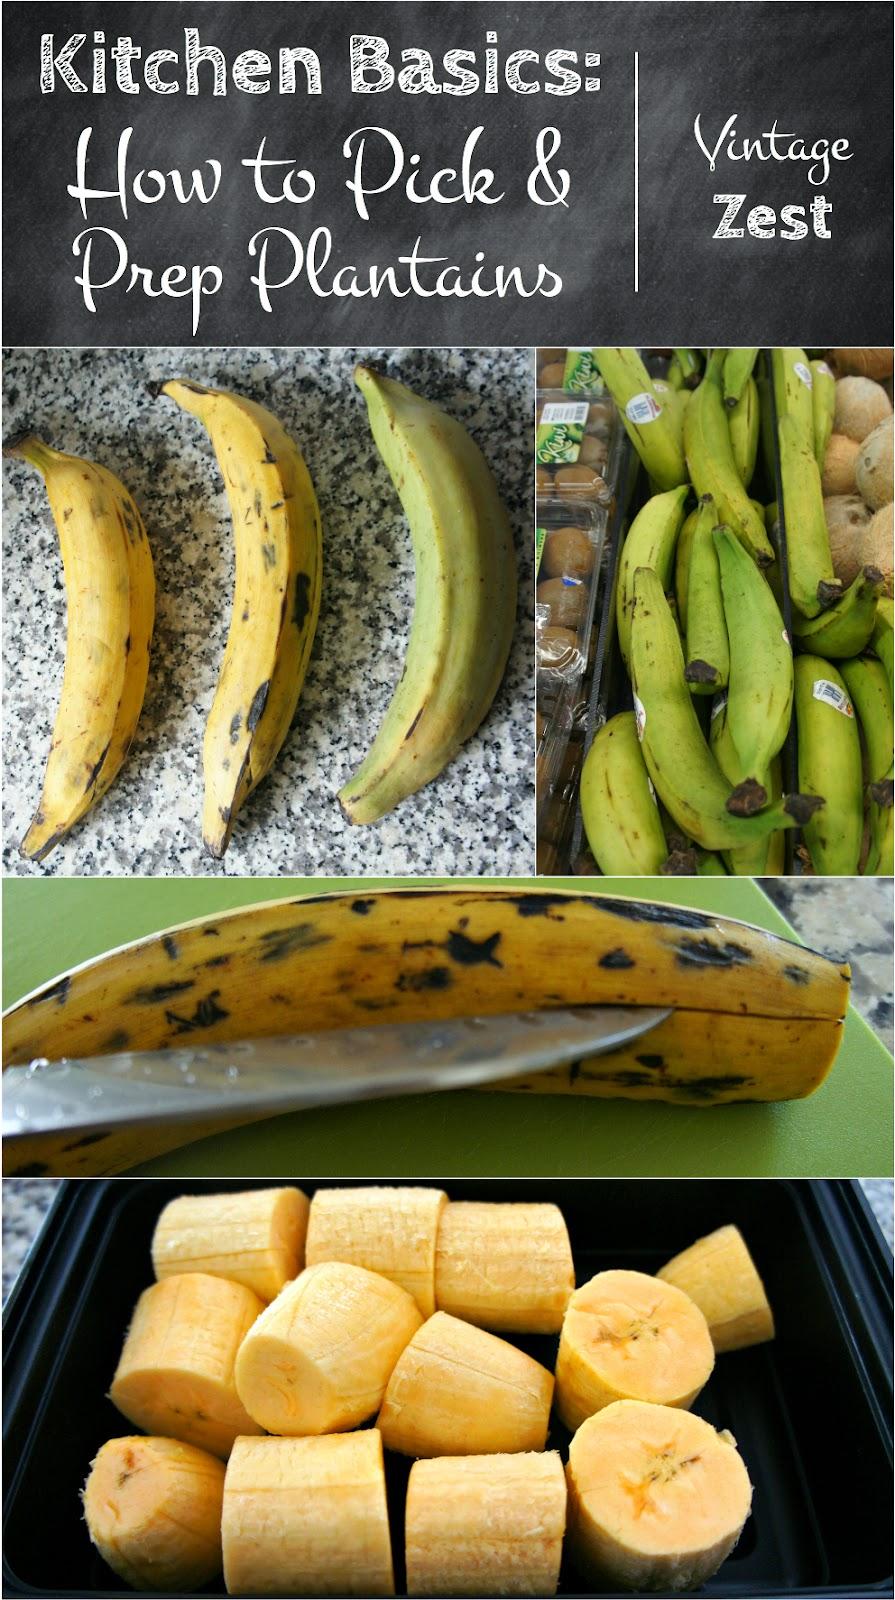 Kitchen Basics: How to Pick & Prep Plantains on Diane's Vintage Zest! #cooking #tip